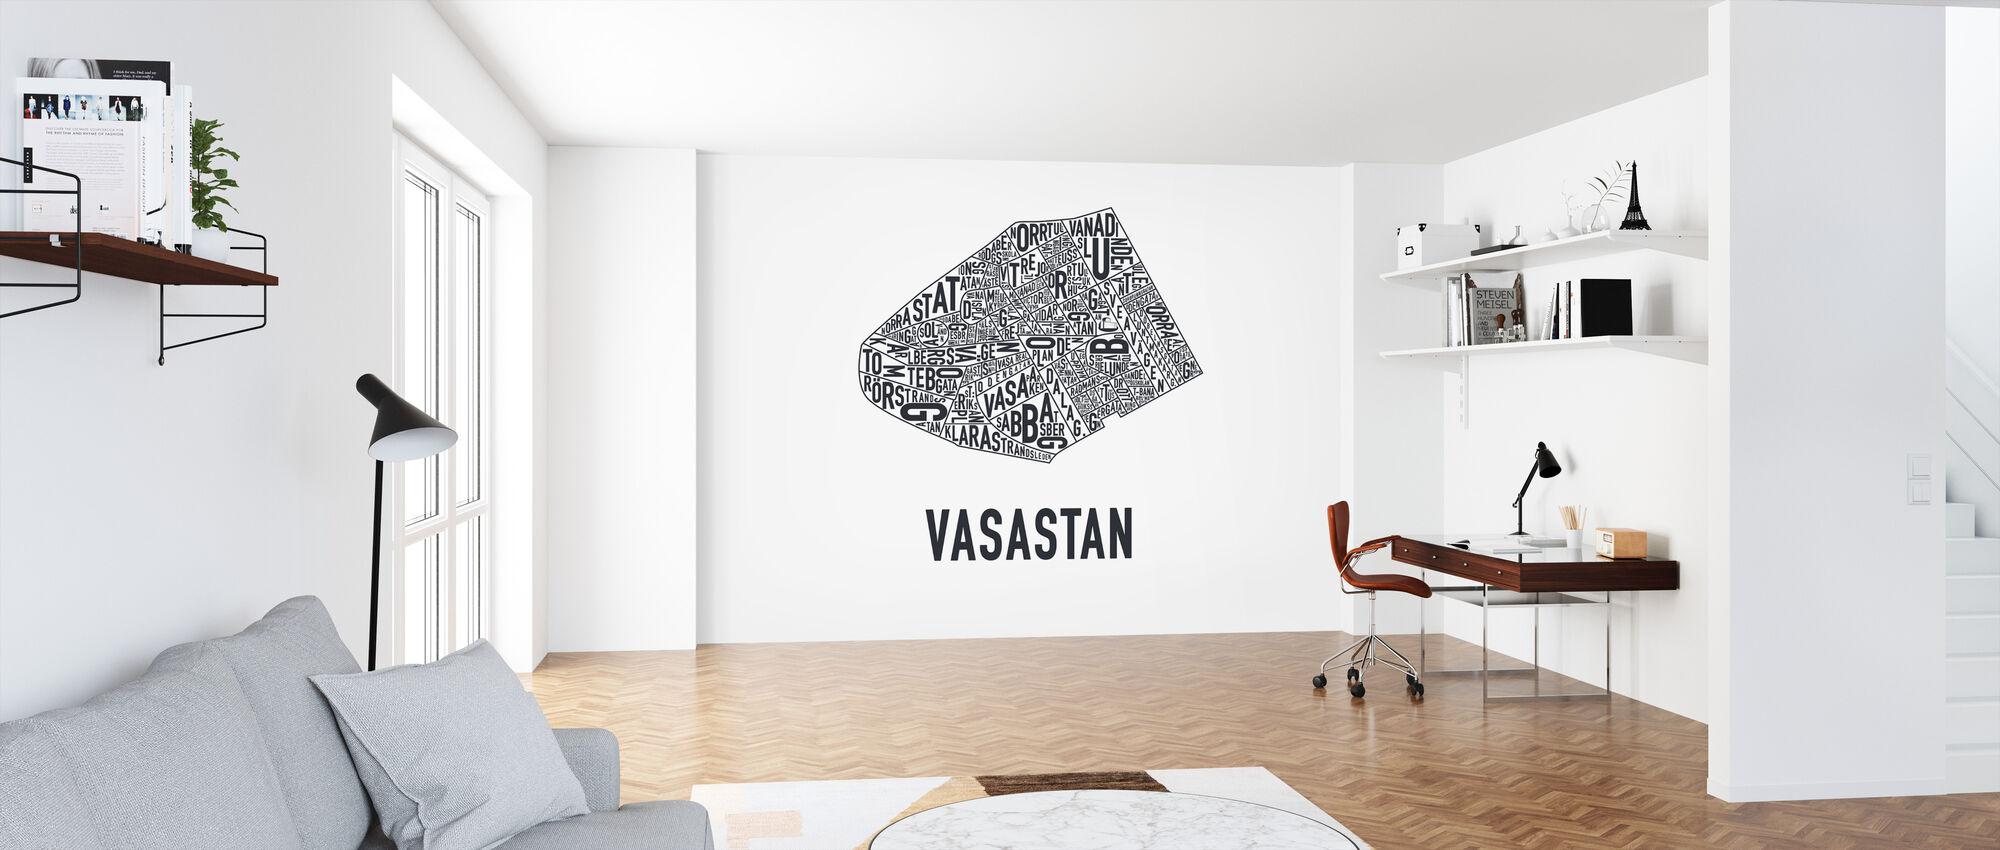 Vasastan - Tapet - Kontor